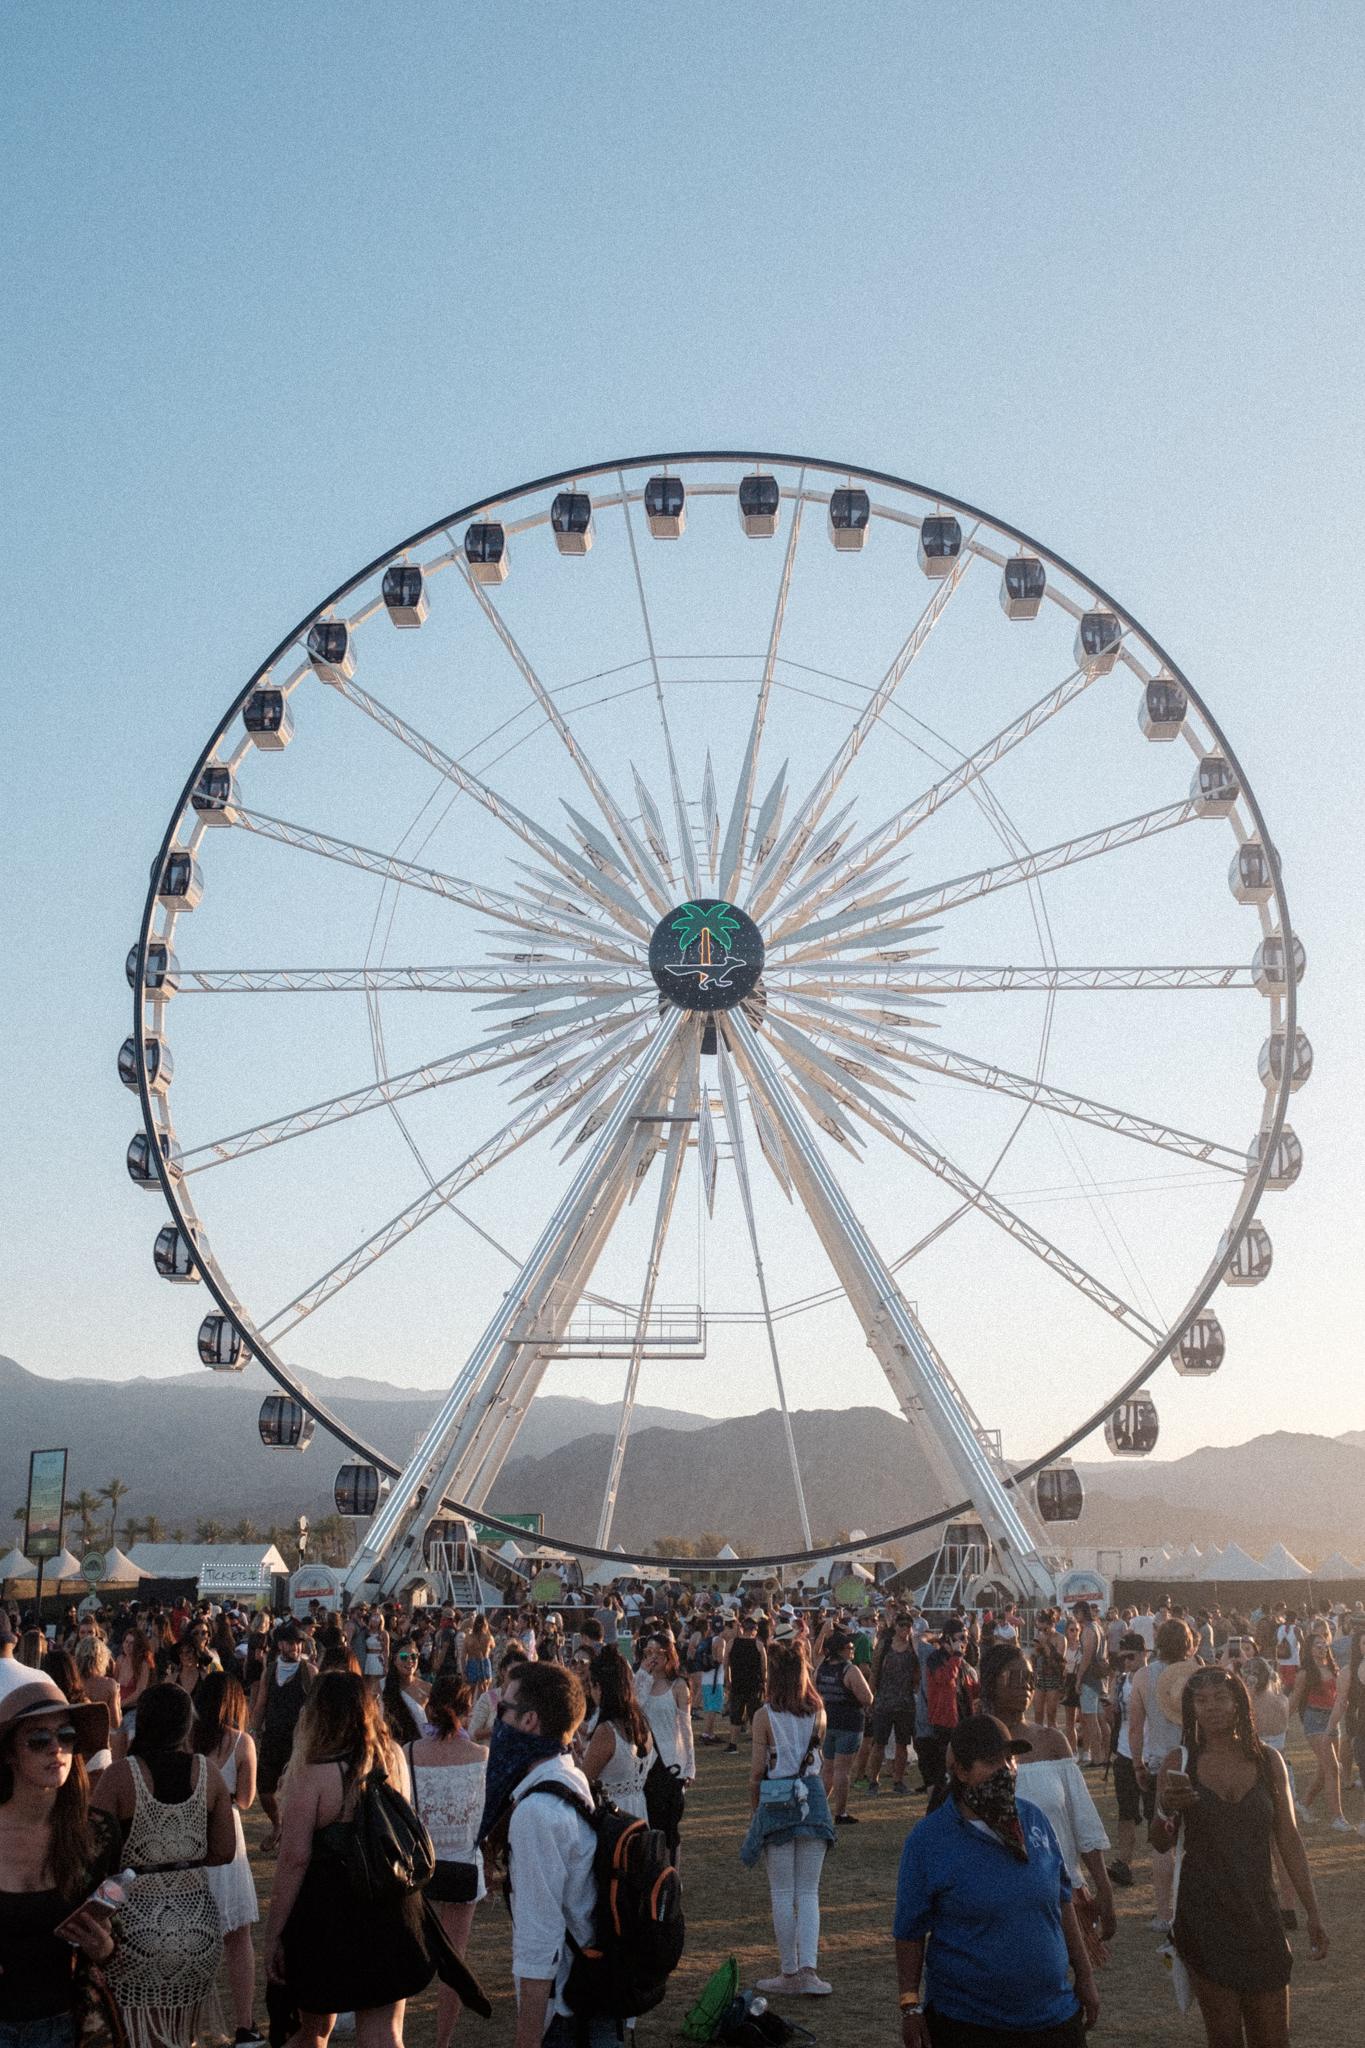 170422 Coachella 17 w2 1861.jpg